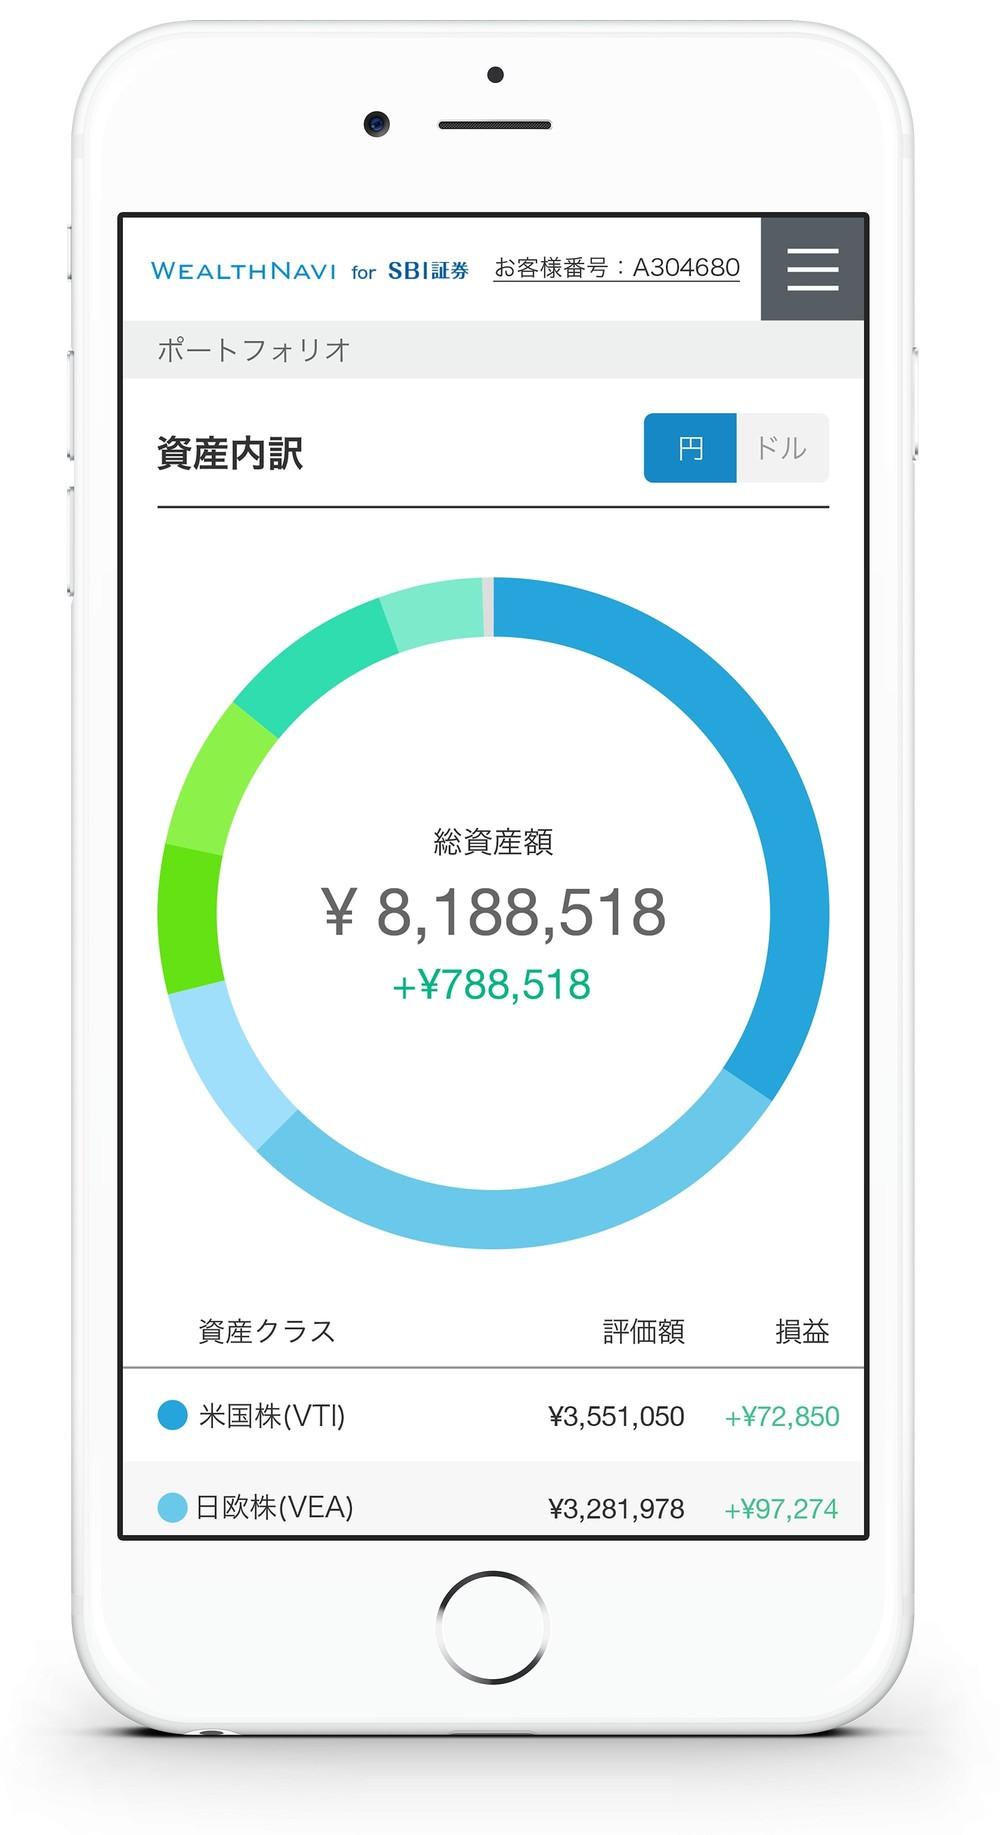 SBI証券の「ロボアドバイザー」サービス、1万口座突破!